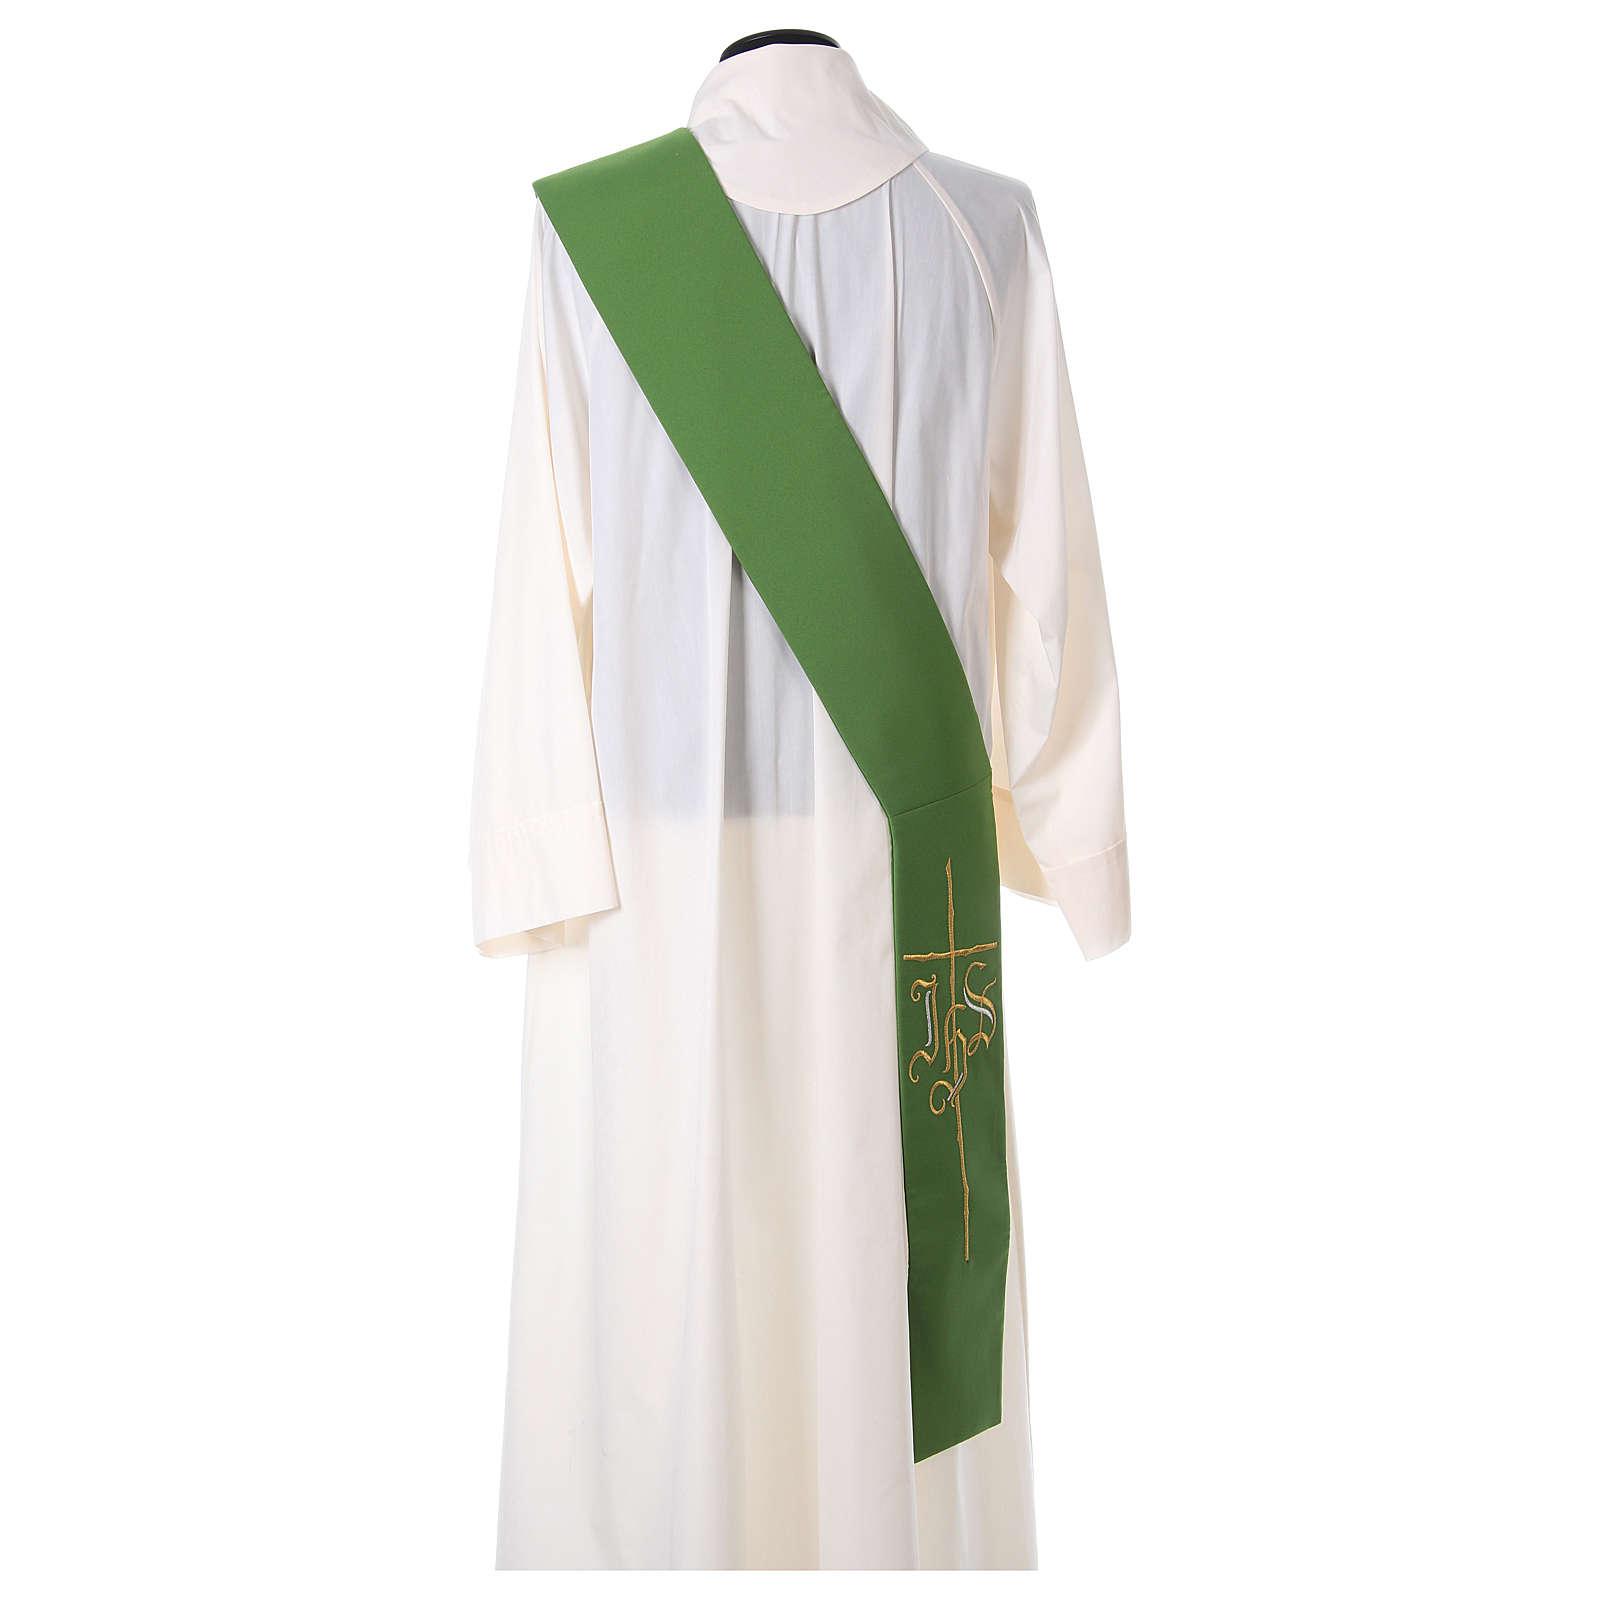 Etole pour diacre croix IHS 100% polyester 4